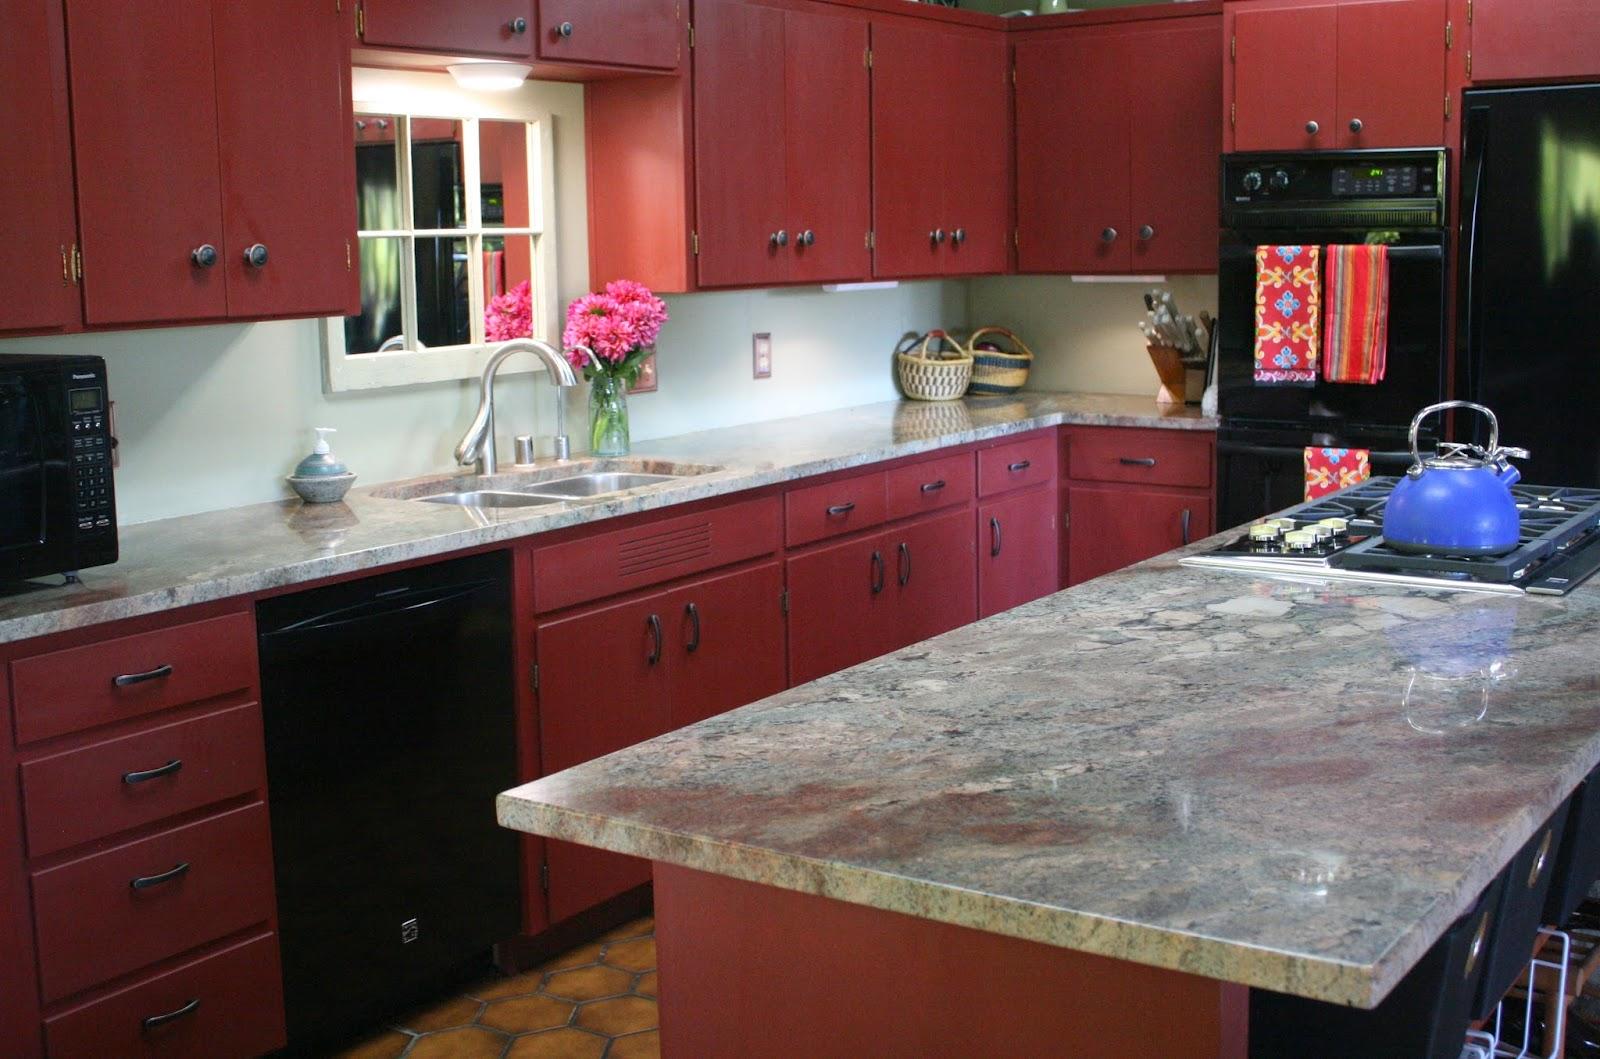 primer red chalk paint kitchen cabinets chalk paint kitchen cabinets Primer Red Chalk Paint Kitchen Cabinets